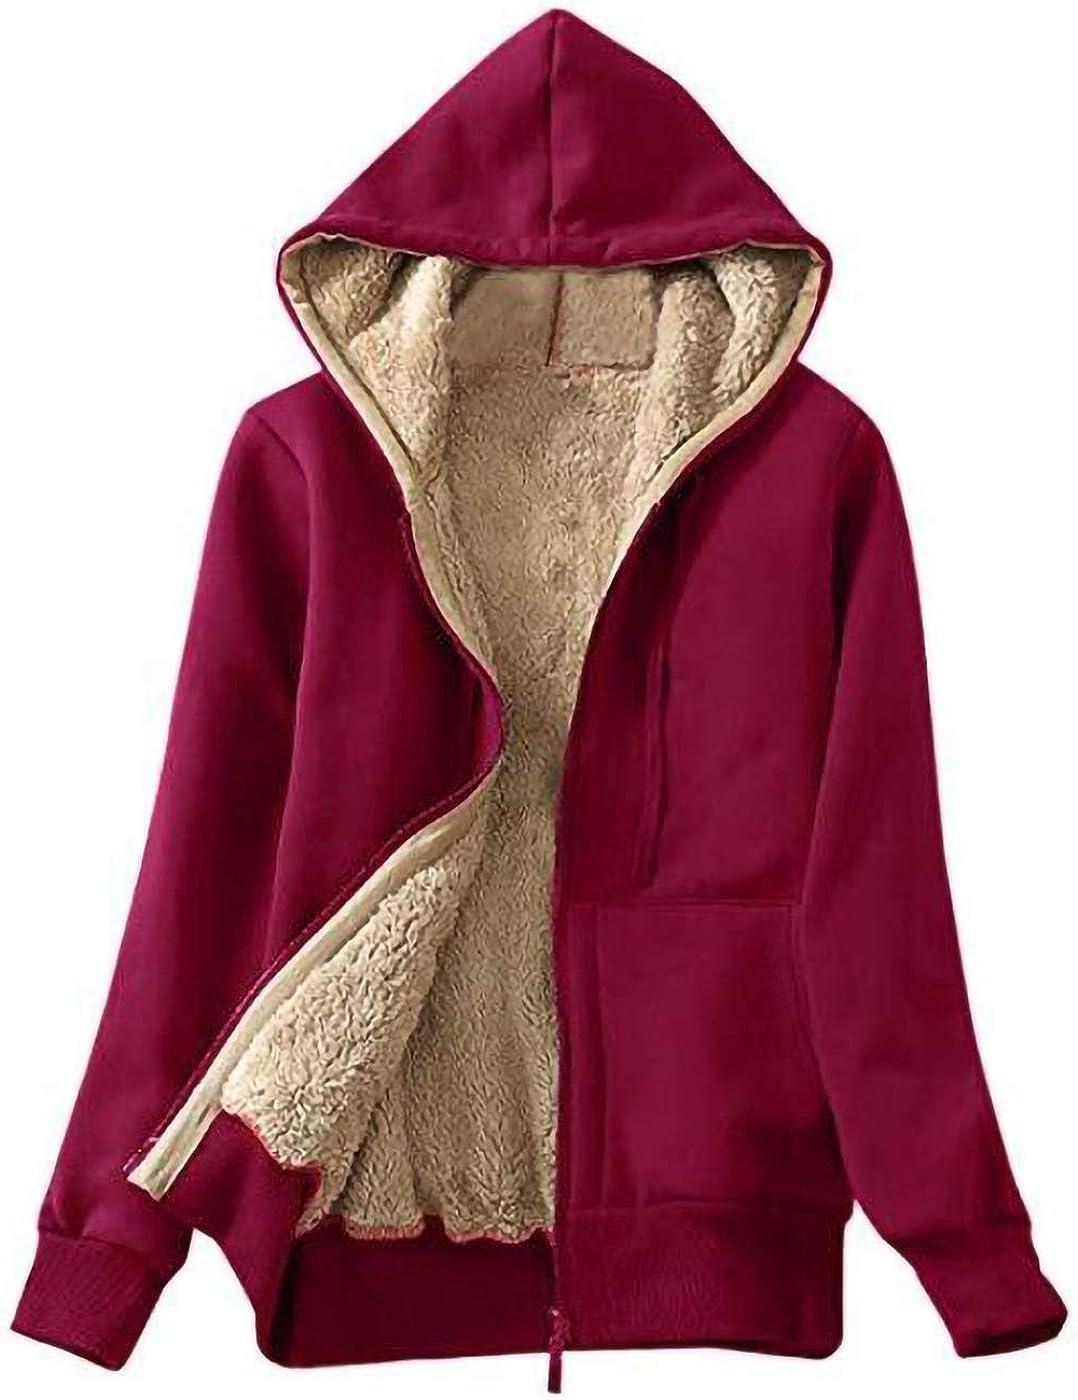 ANNA-KACI Womens Solid Thick Sherpa Fleece Lined Zip Up Pockets Hoodie Sweatshirt Jacket